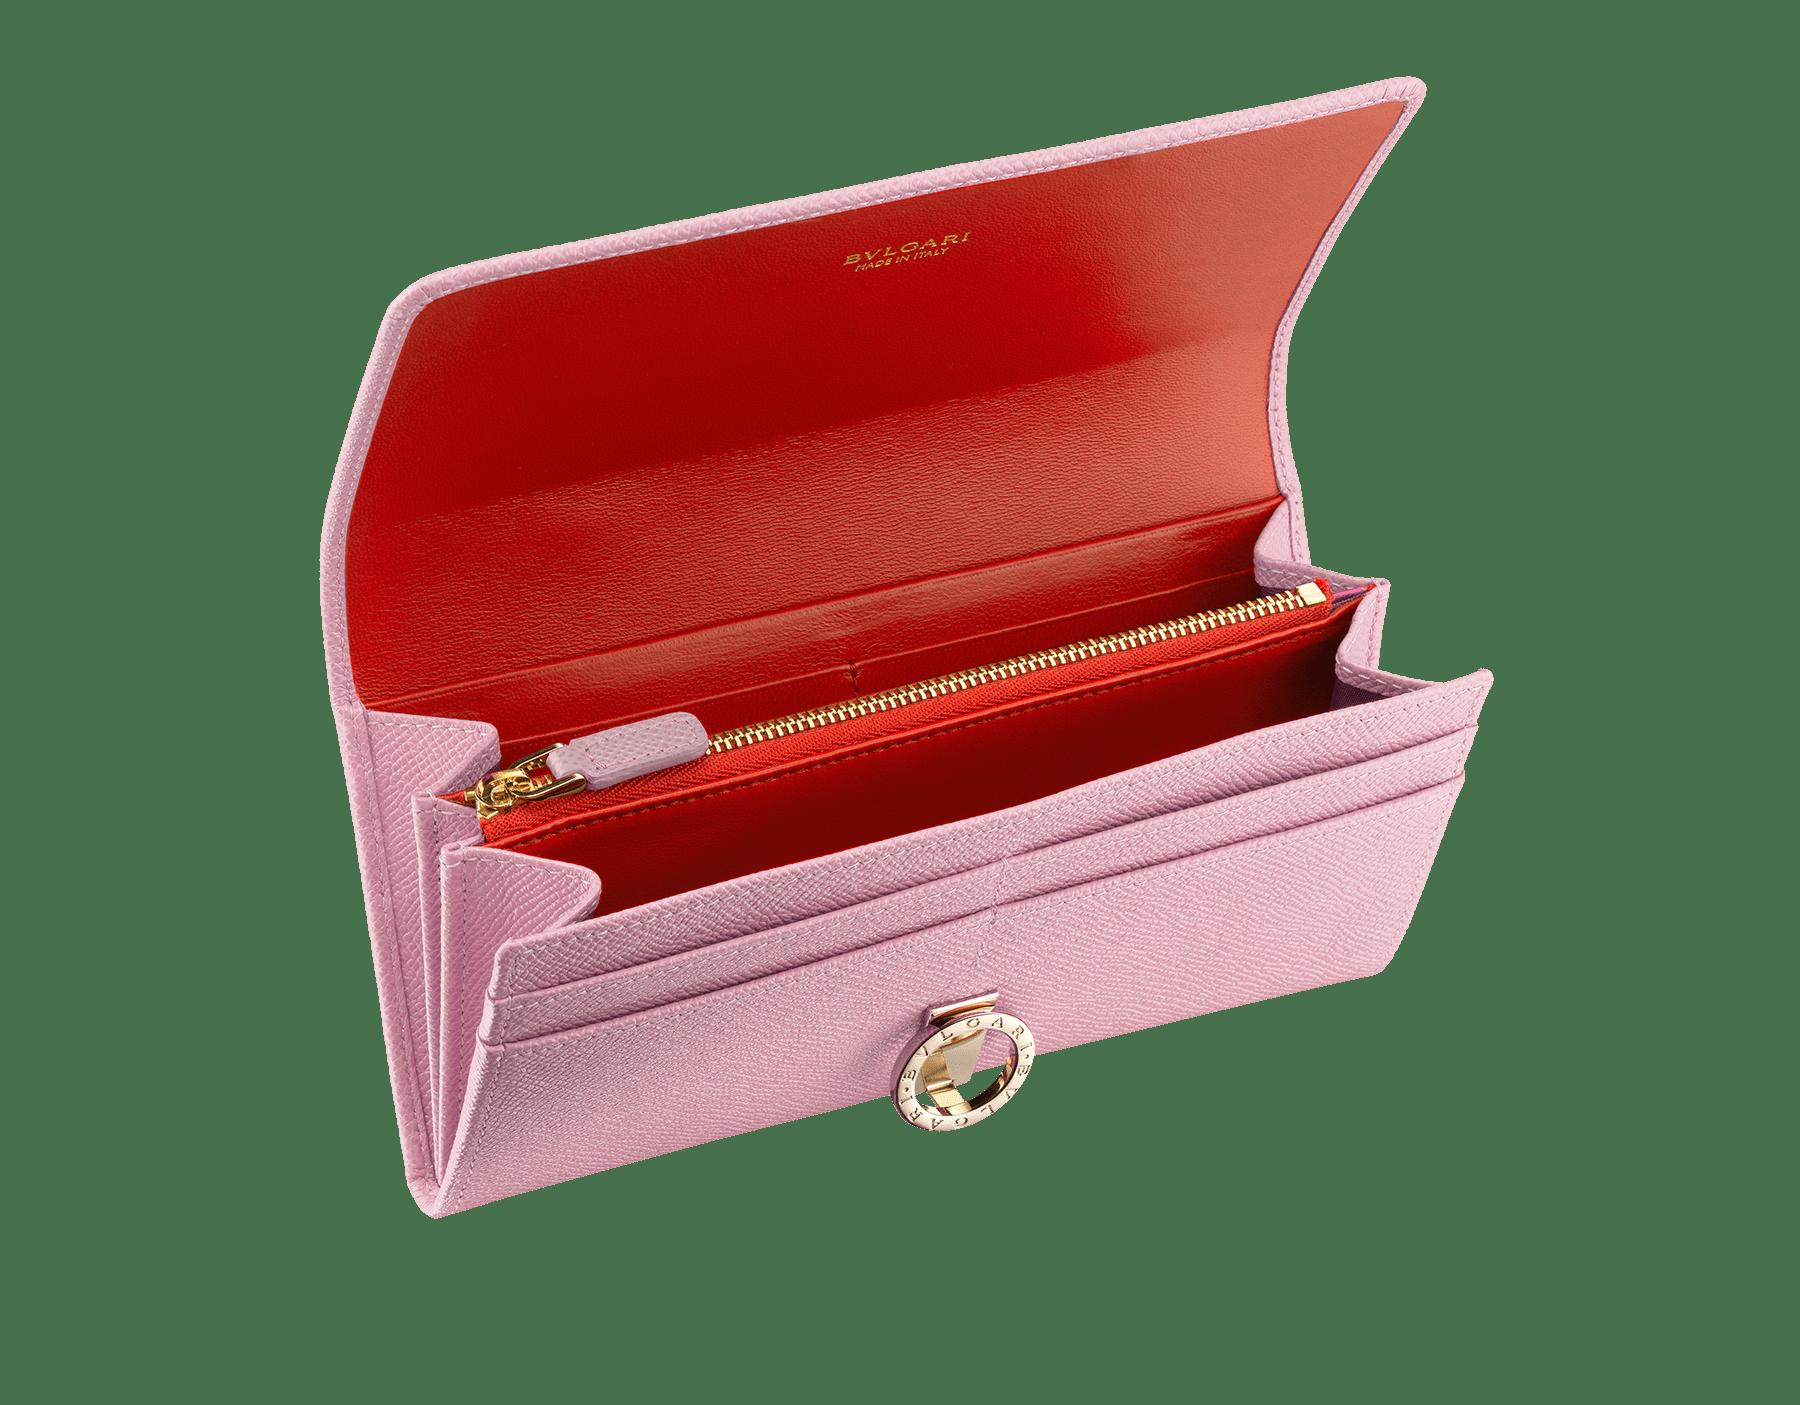 Wallet pochette in pink agate bright grain calf leather and jasper flame nappa. Brass light gold plated hardware and iconic Bulgari-Bulgari closure clip. 282869 image 2